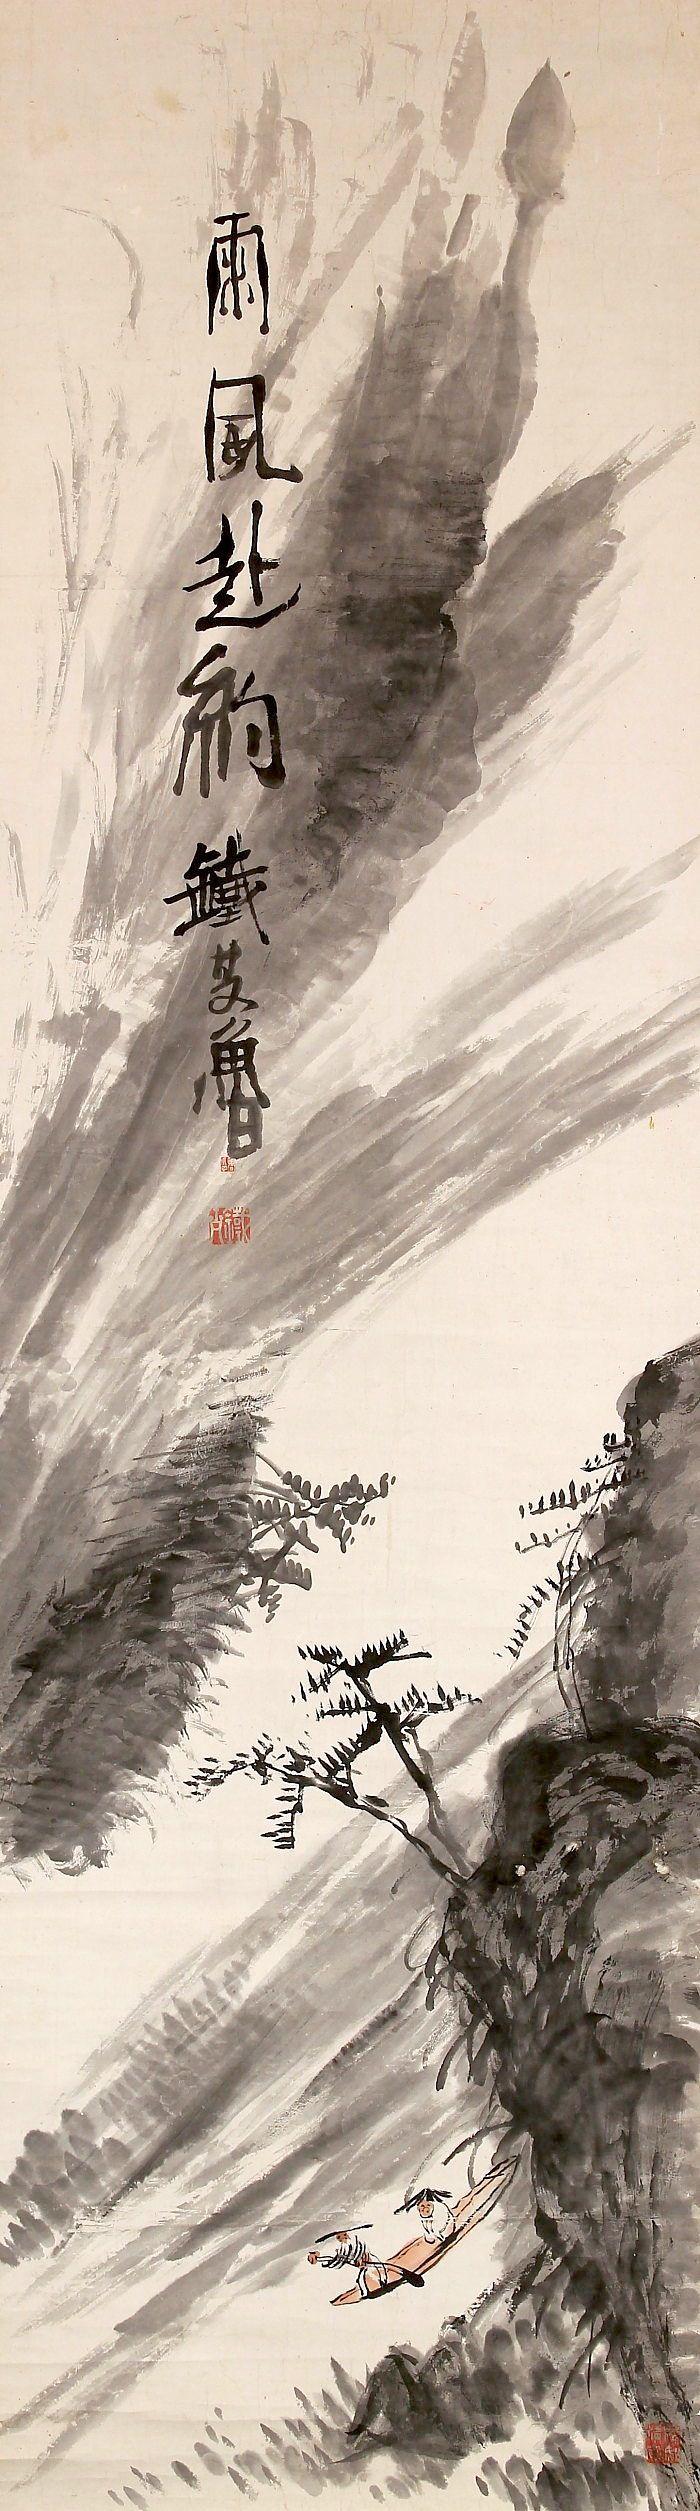 Tomioka Tessai 富岡鉄斎 (1837-1924), Landscape with Rapids.